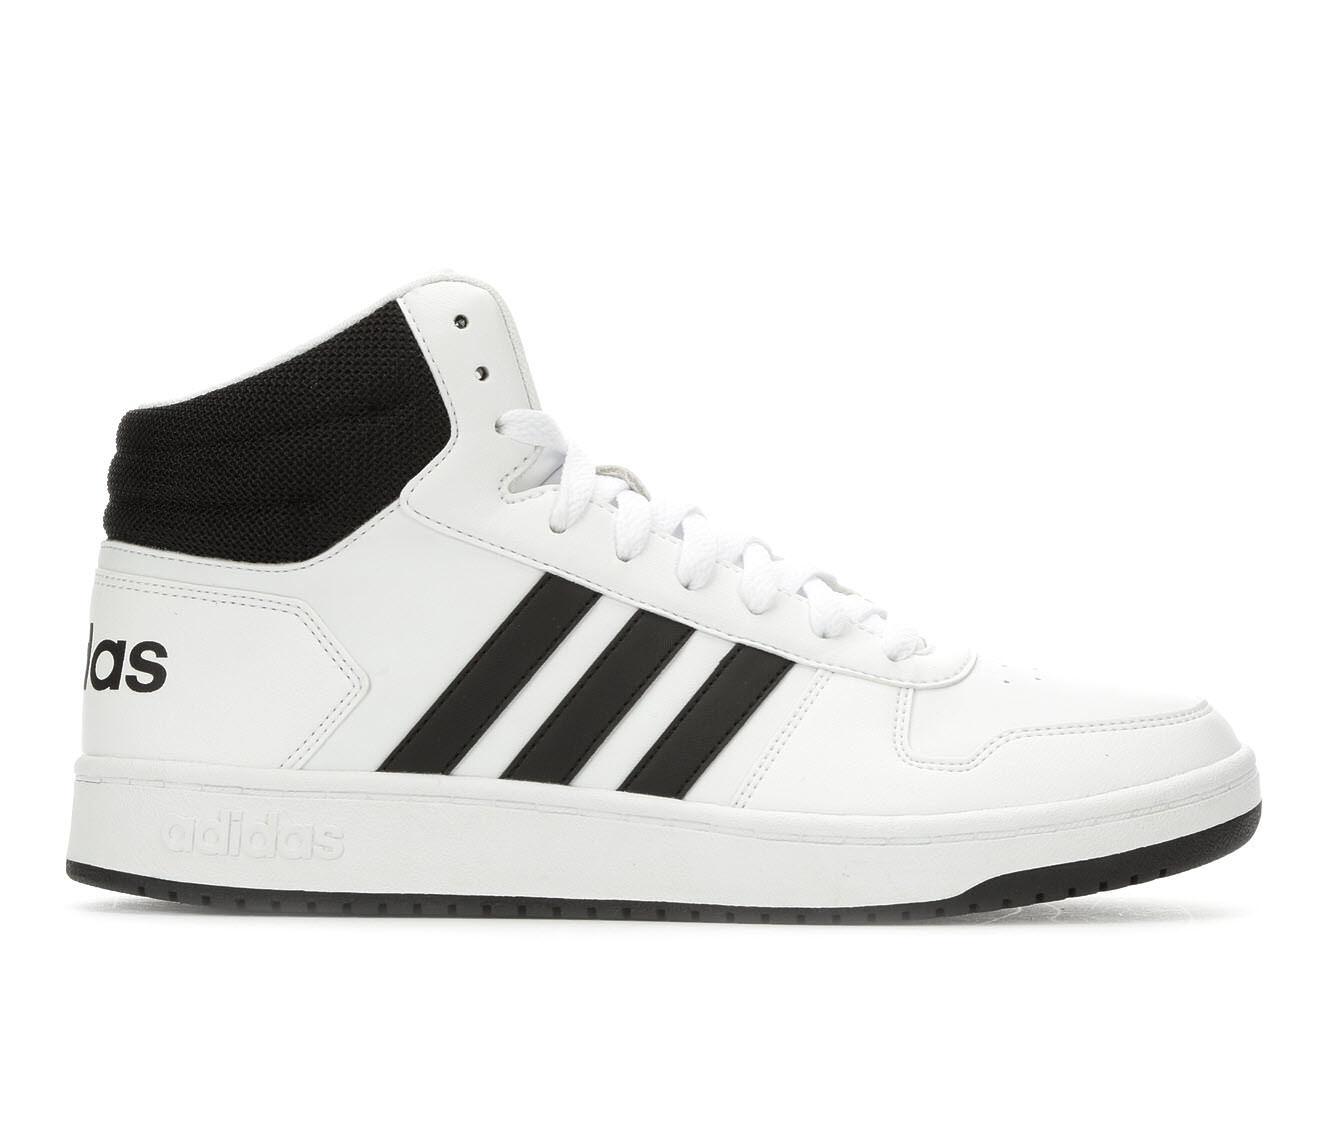 Men's Adidas Hoops 2.0 Mid Retro Sneakers White/Black